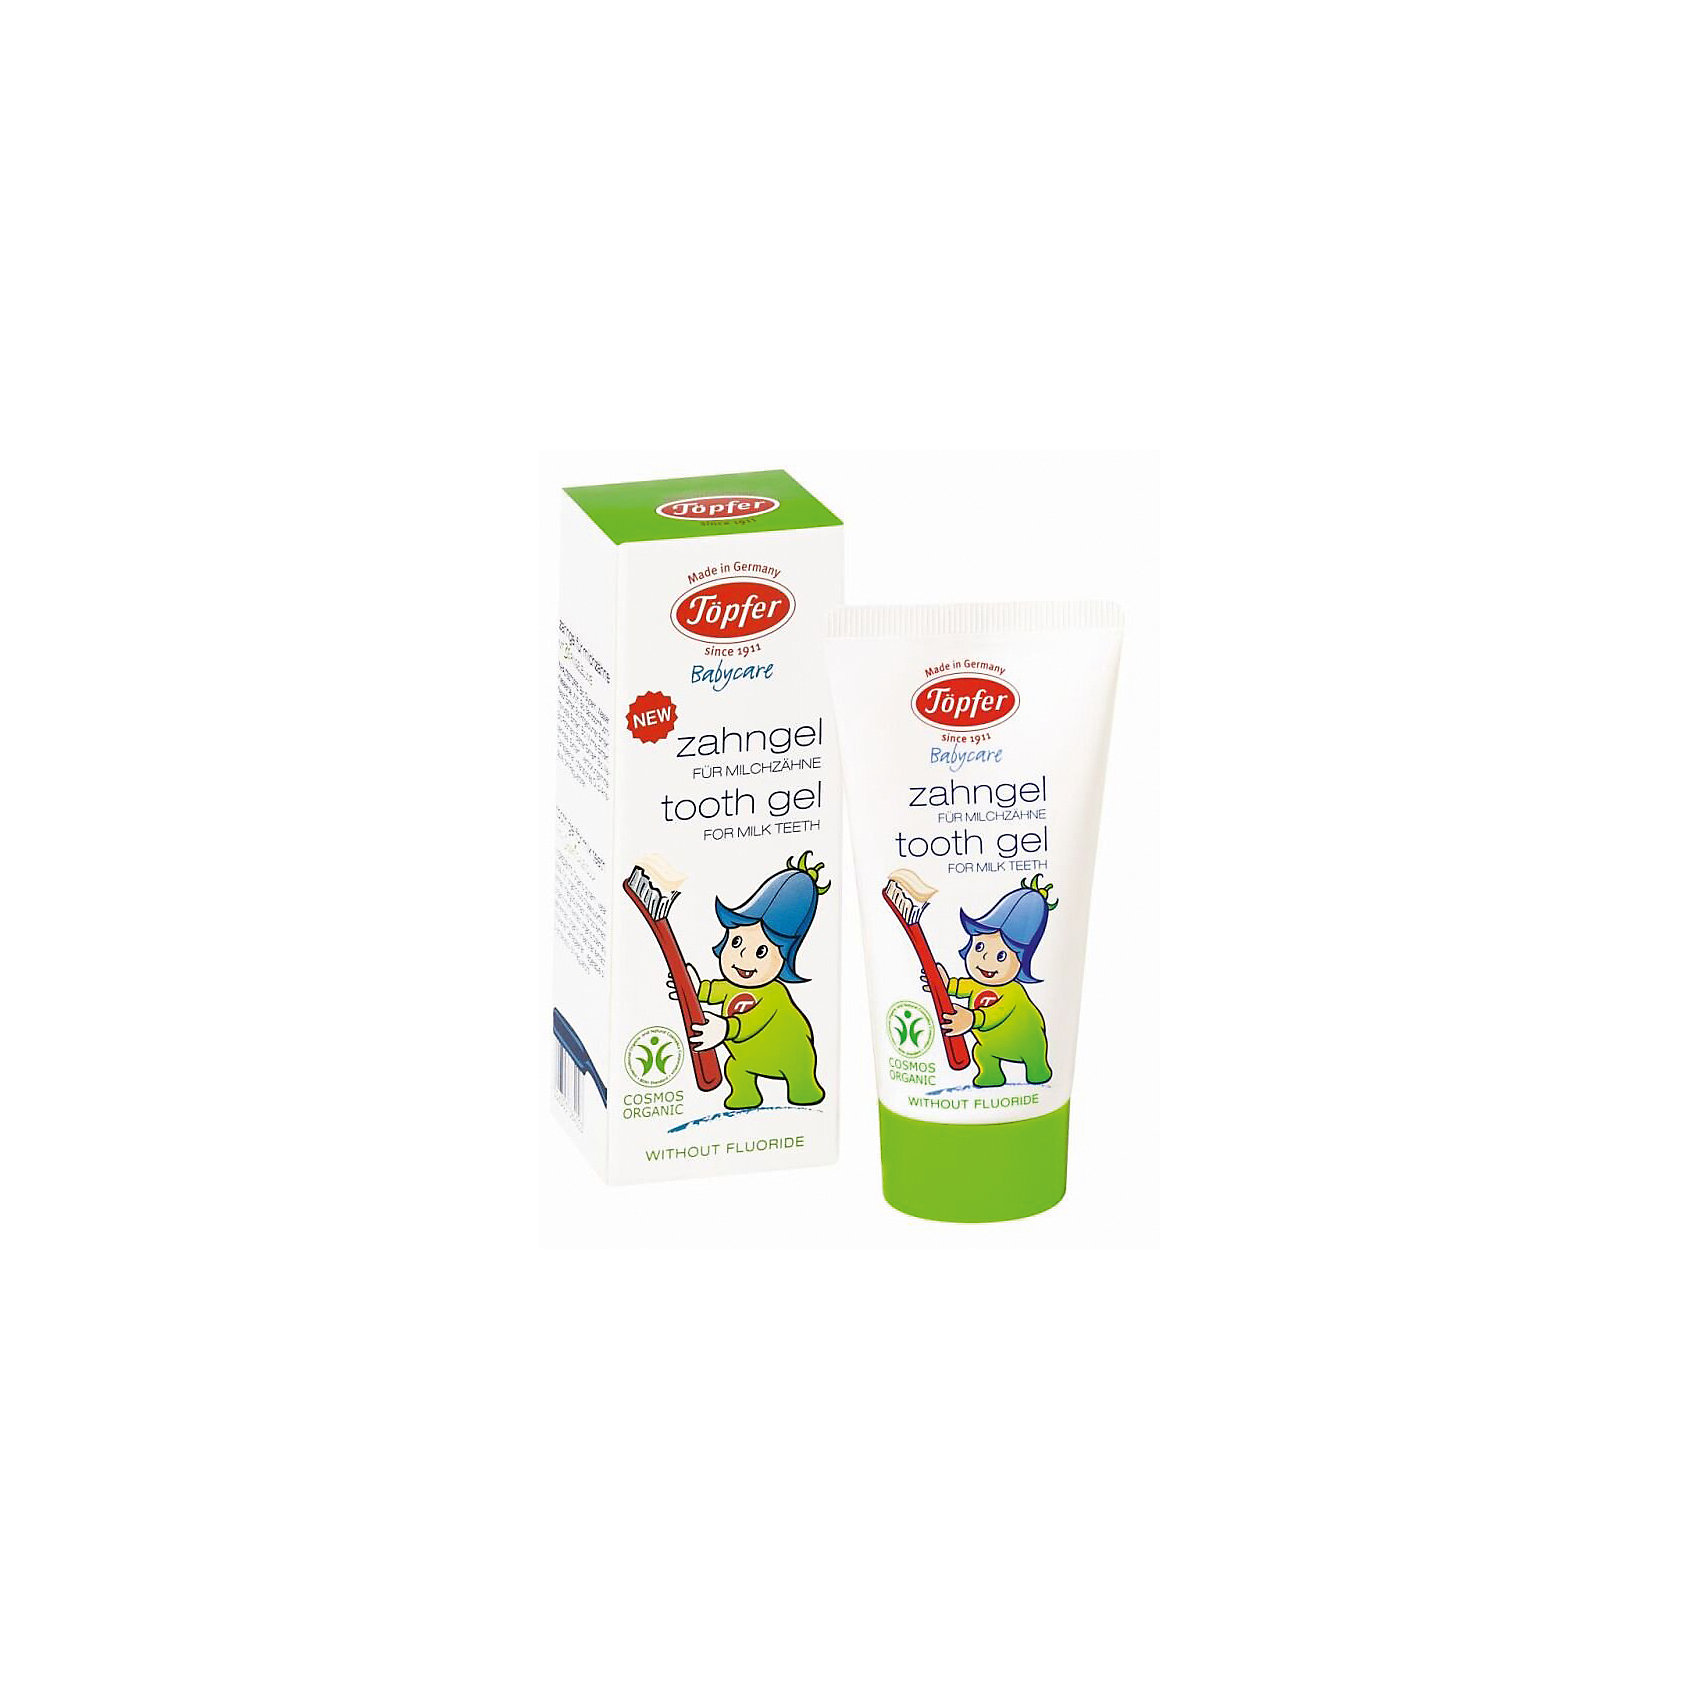 Зубная паста для молочных зубов, 50мл., 3-7 лет, Topfer